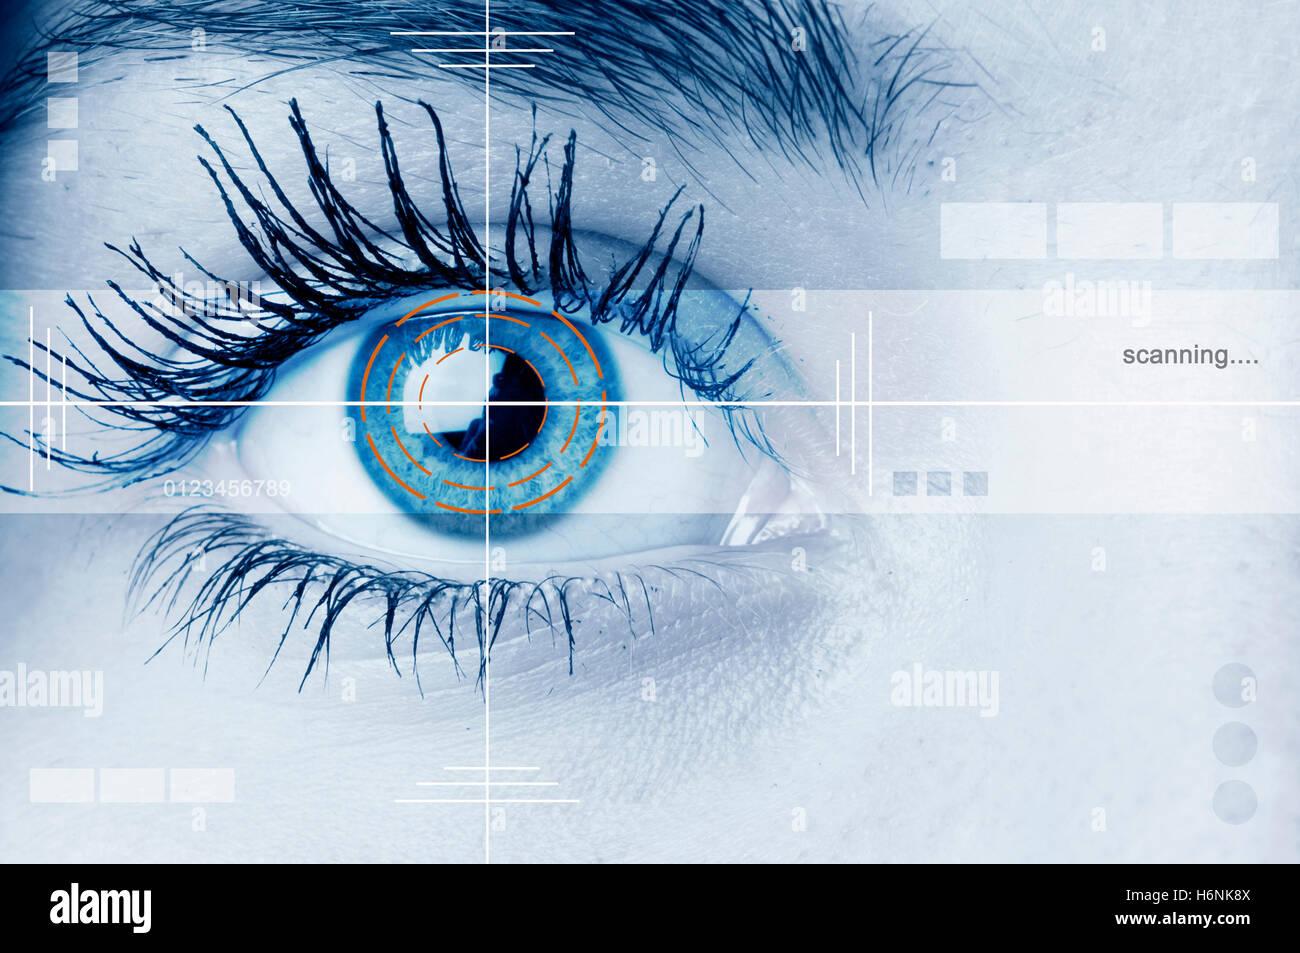 biometric retina scan - Stock Image